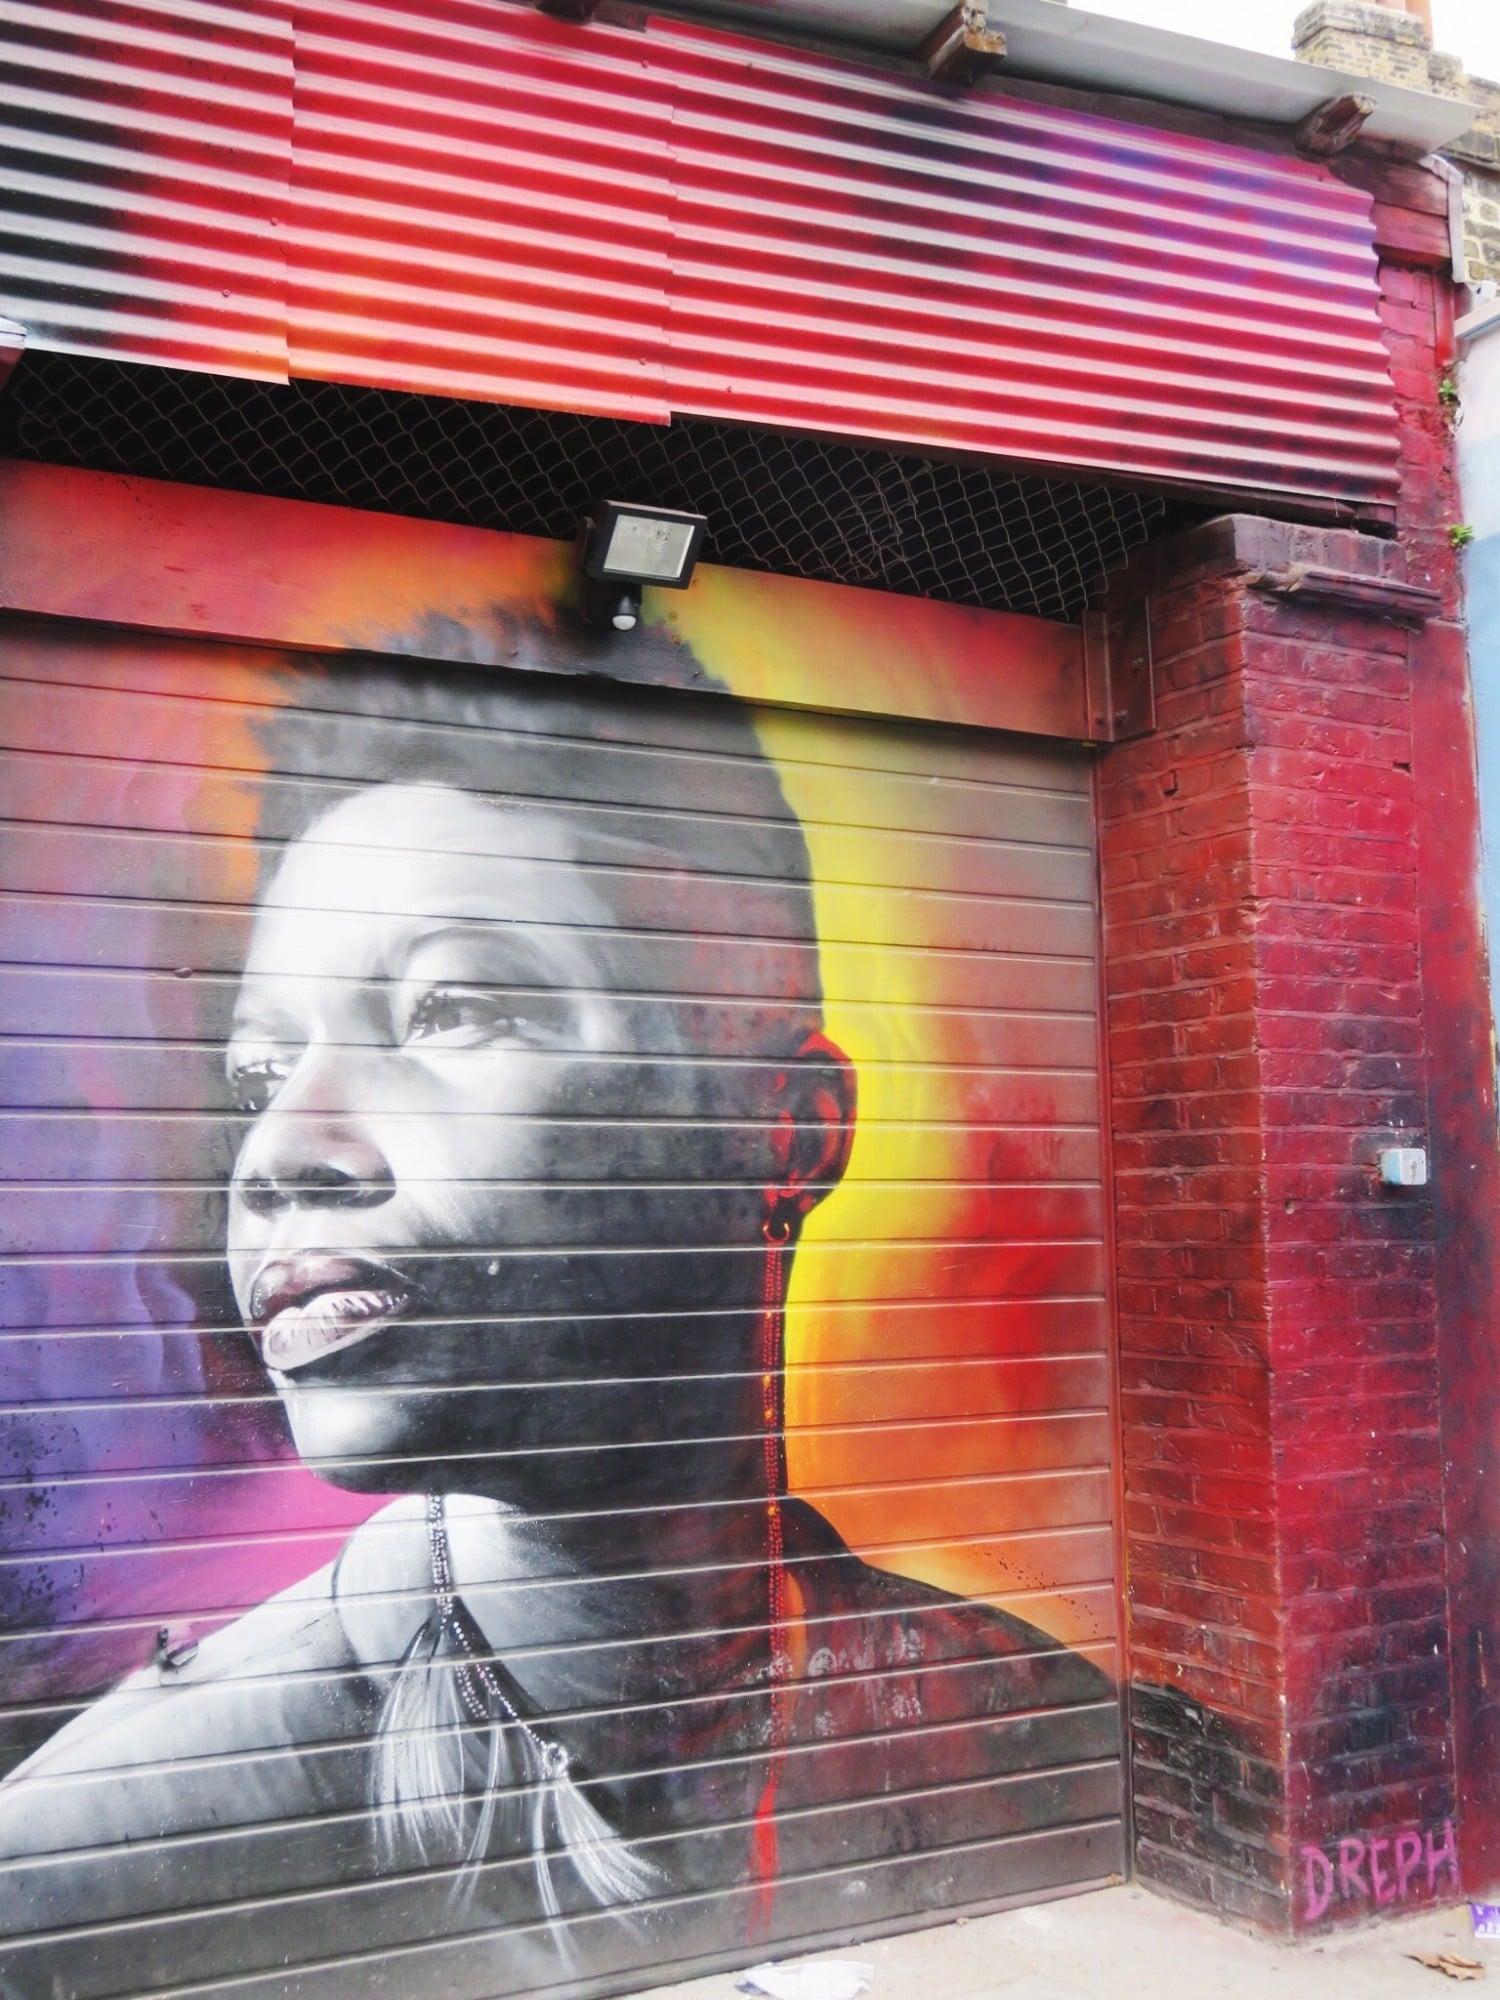 Shoreditch Street Art: Street Art In Shoreditch: Step Into A World Of Colour